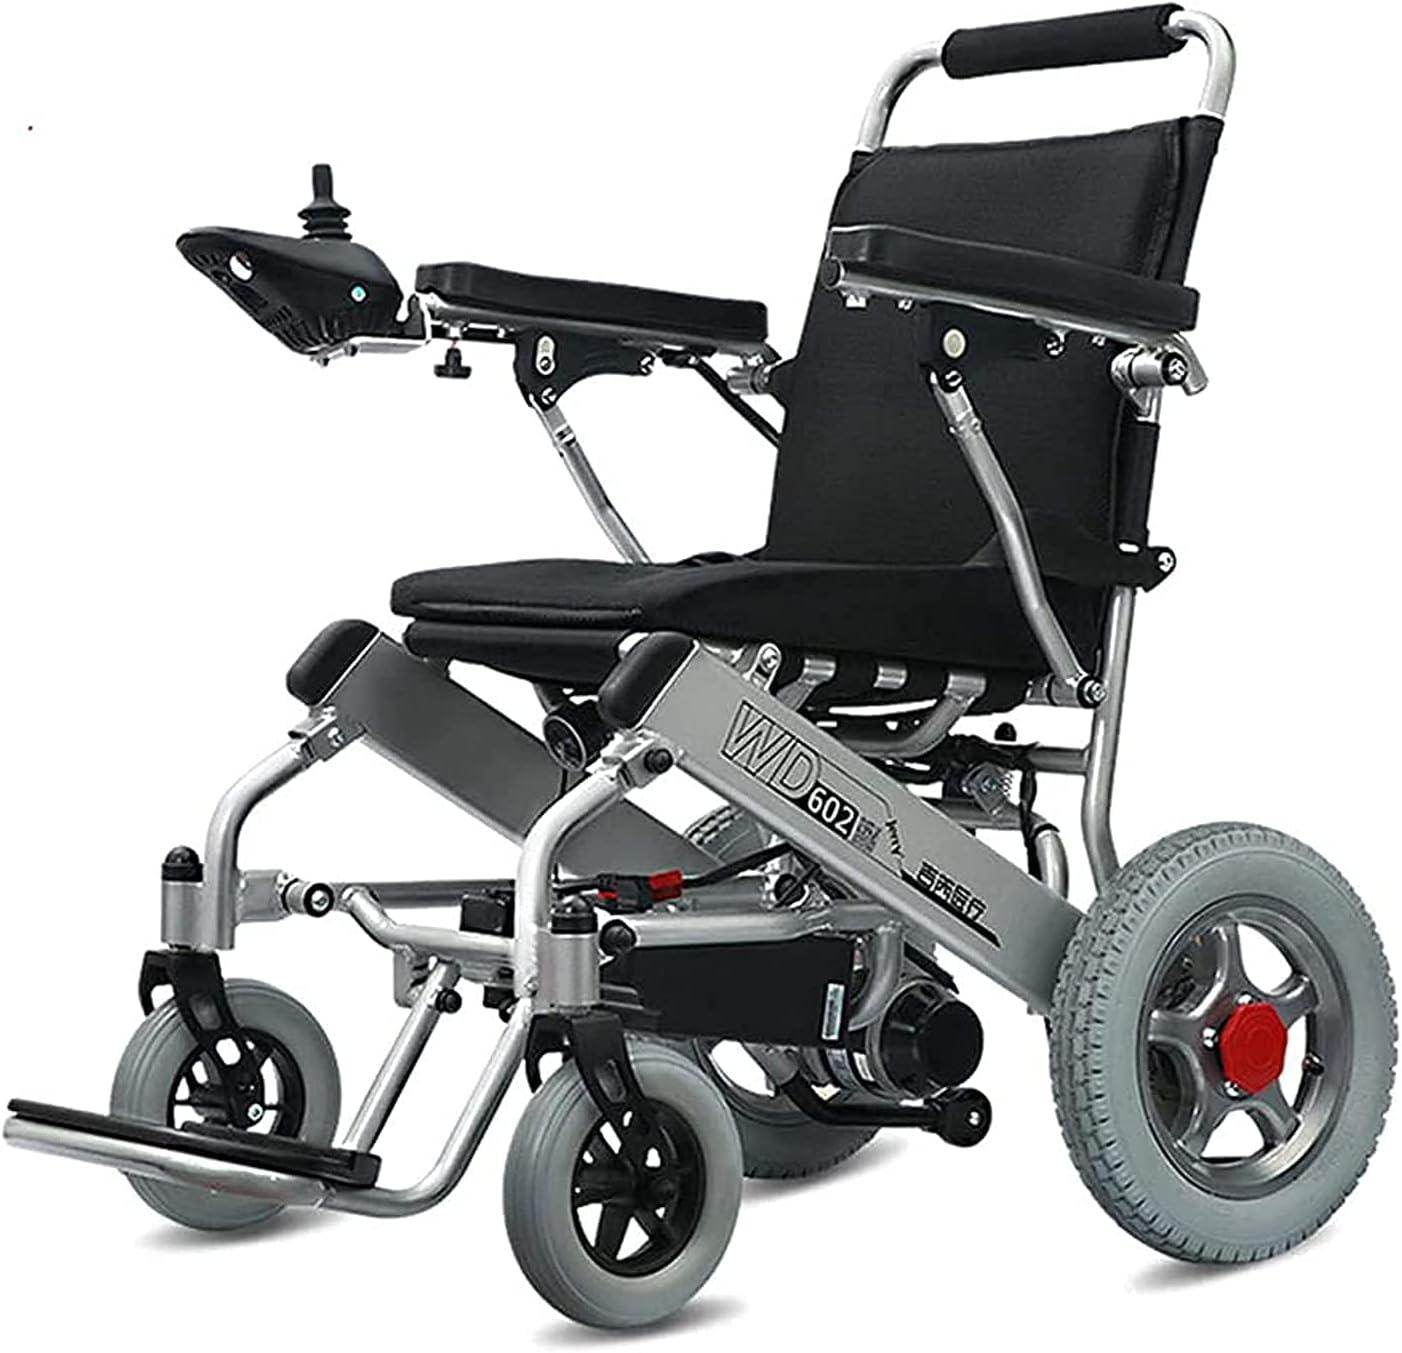 SLRMKK Silla de Ruedas eléctrica motorizada portátil, Plegable, Ligera, de Doble Motor, Resistente a la Intemperie, Segura para Viajes